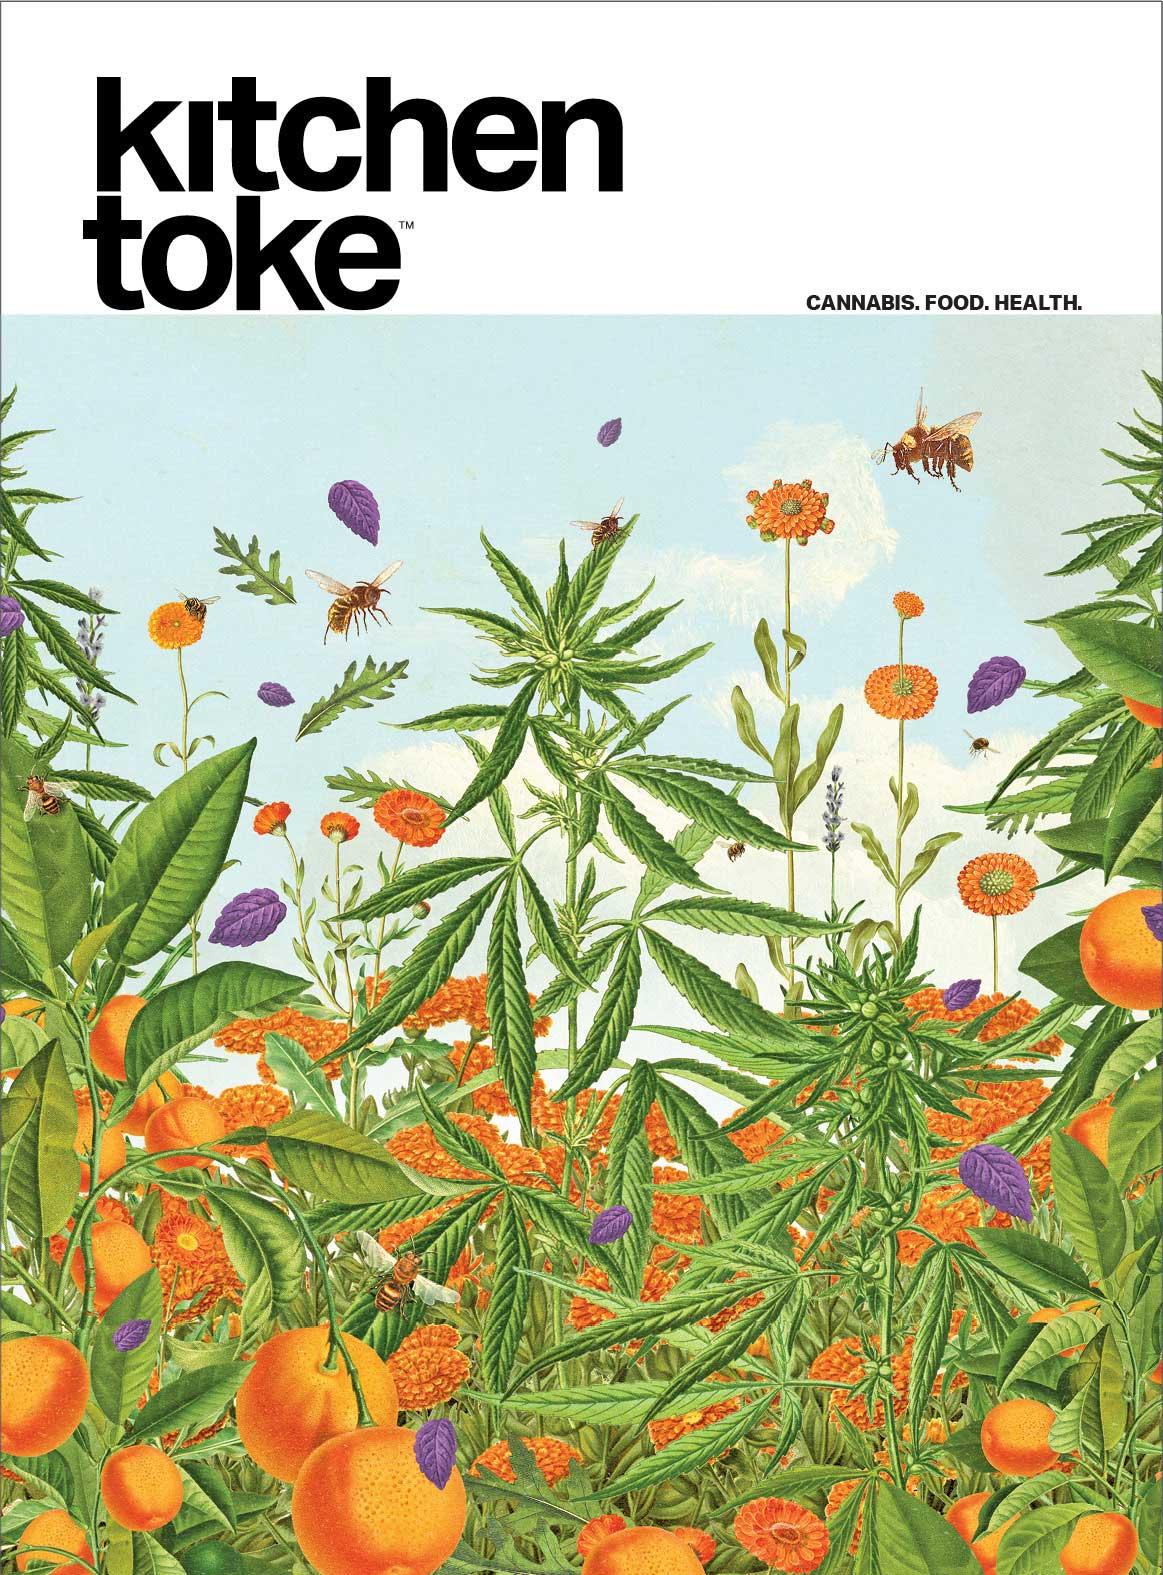 Kitchen Toke Magazine Volume 5 Issue 1